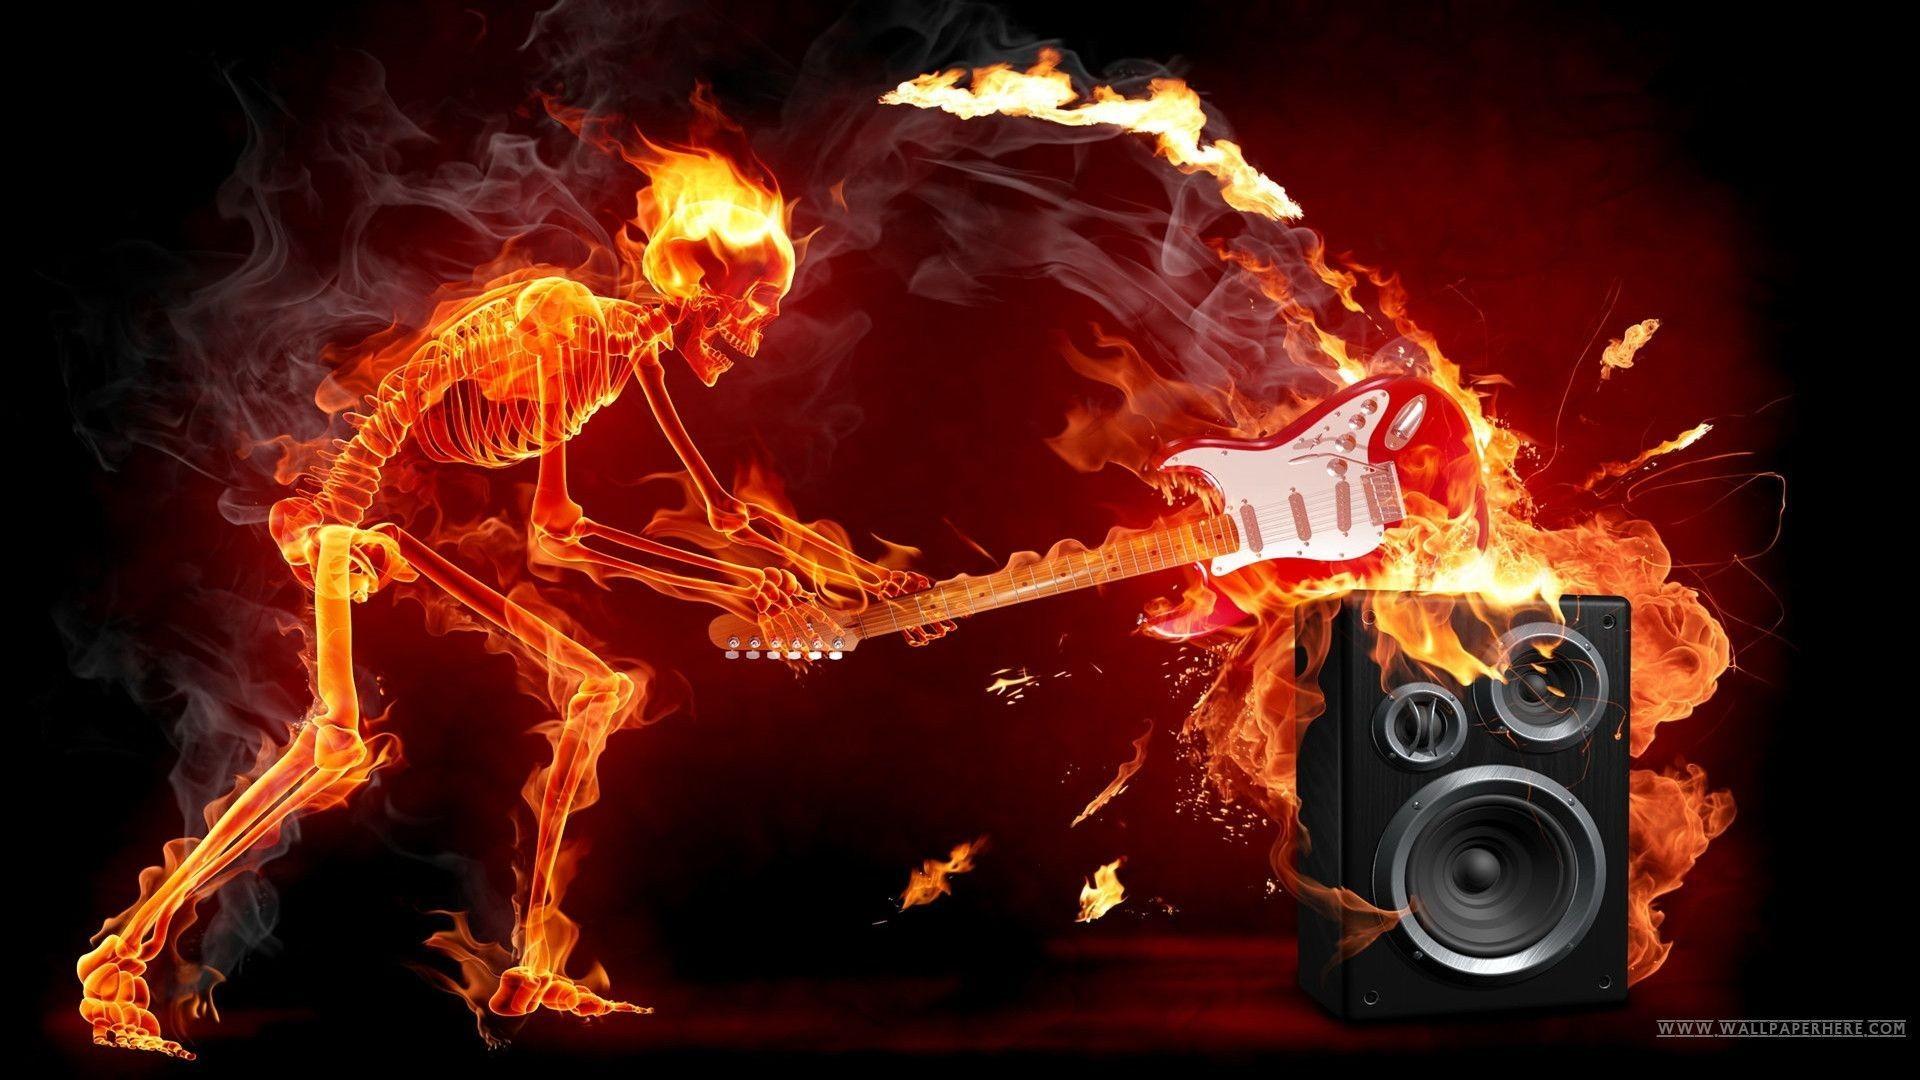 2560x1600 Ghost Rider Movie Bike Motorcycle Skull Wallpaper